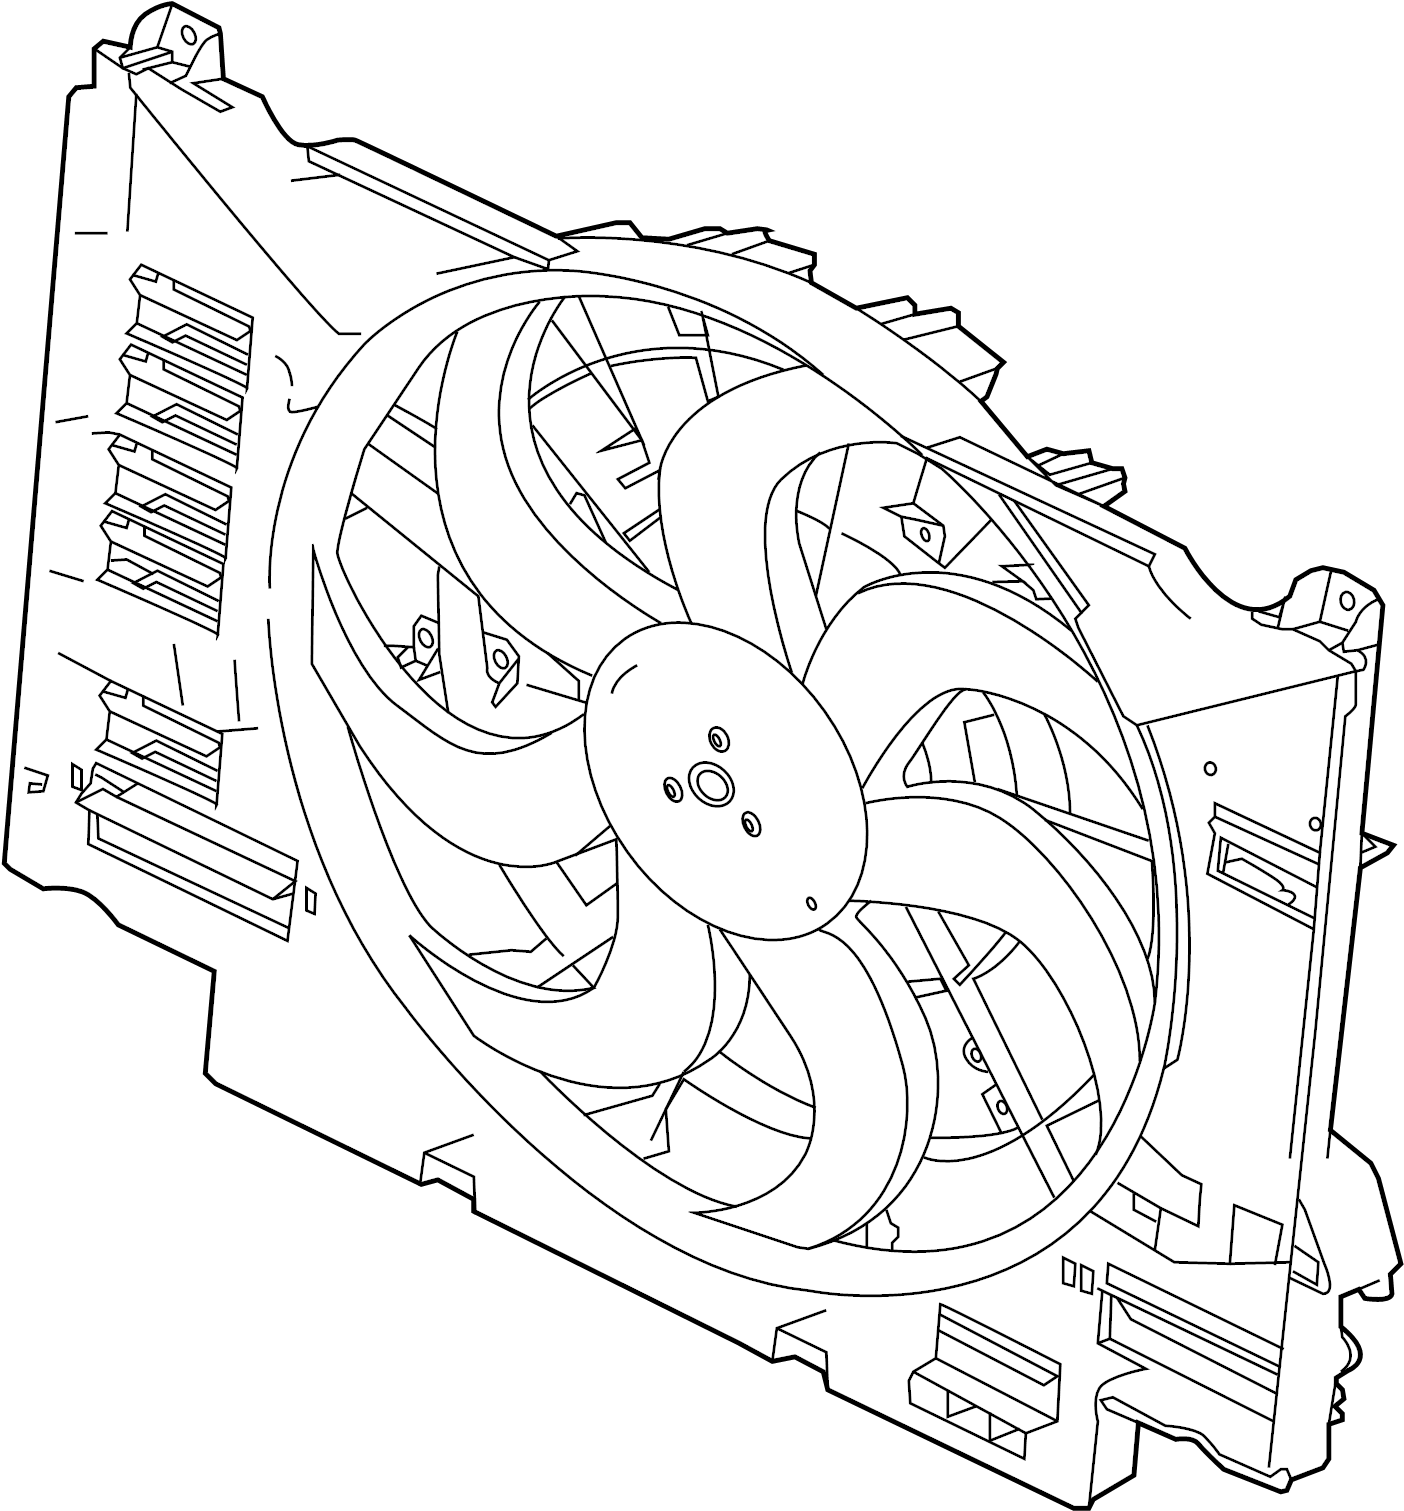 Jaguar Xf Engine Cooling Fan Assembly